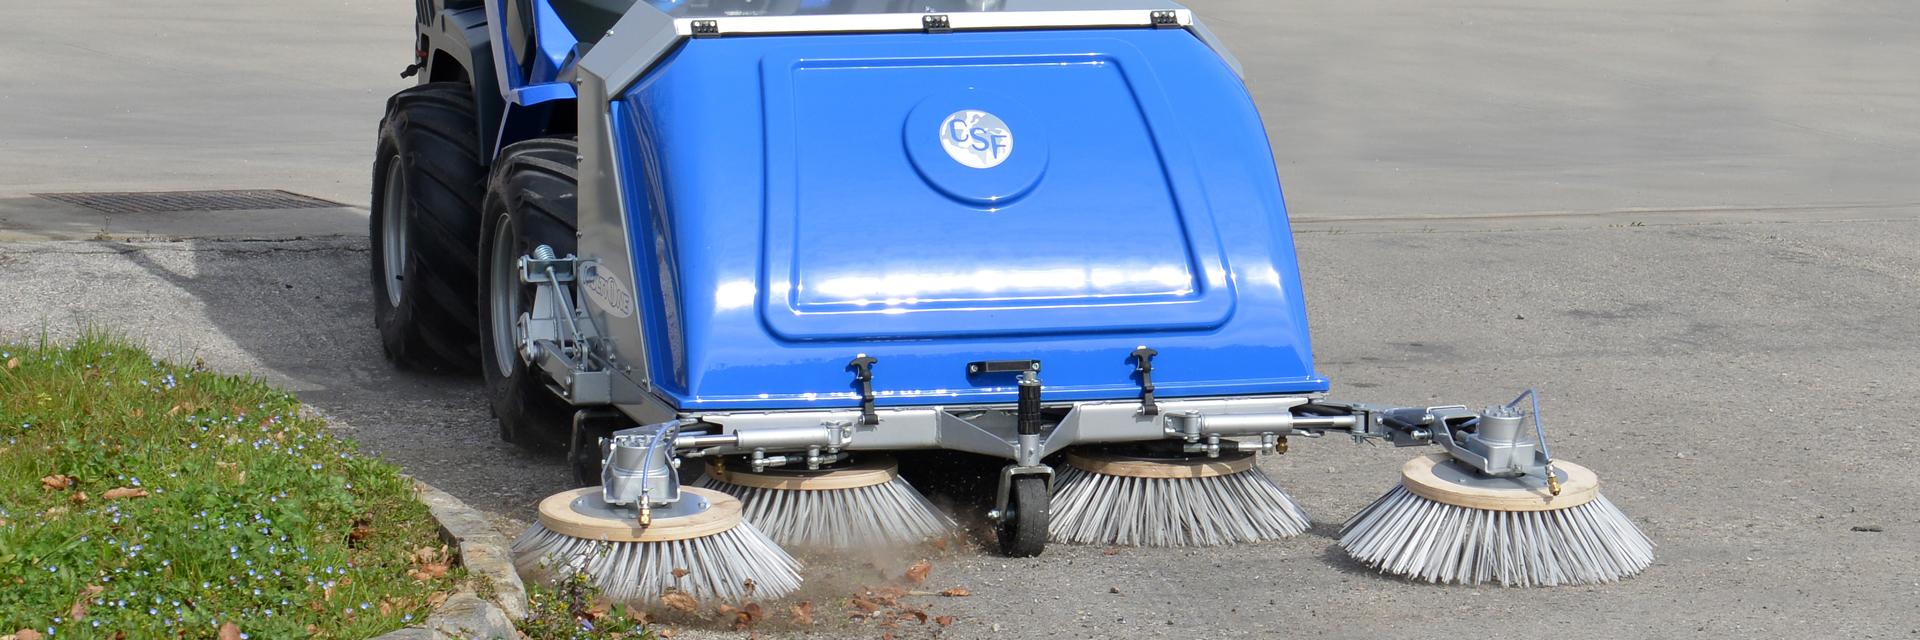 Multione_vacuum_sweeper_attachment